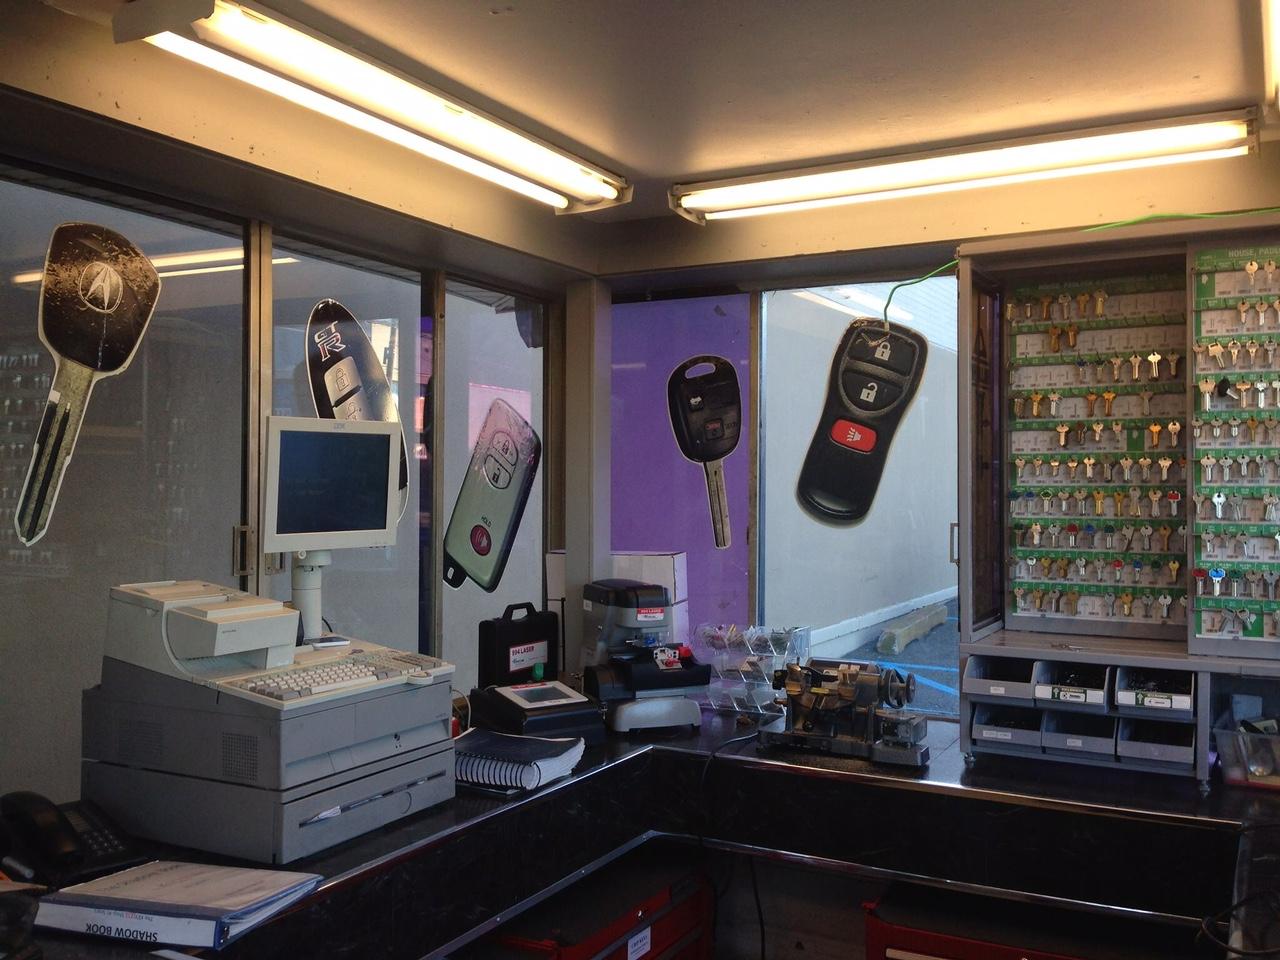 Sears Key Shop operated by The Keyless Shop automotive locksmiths of Hackensack, NJ